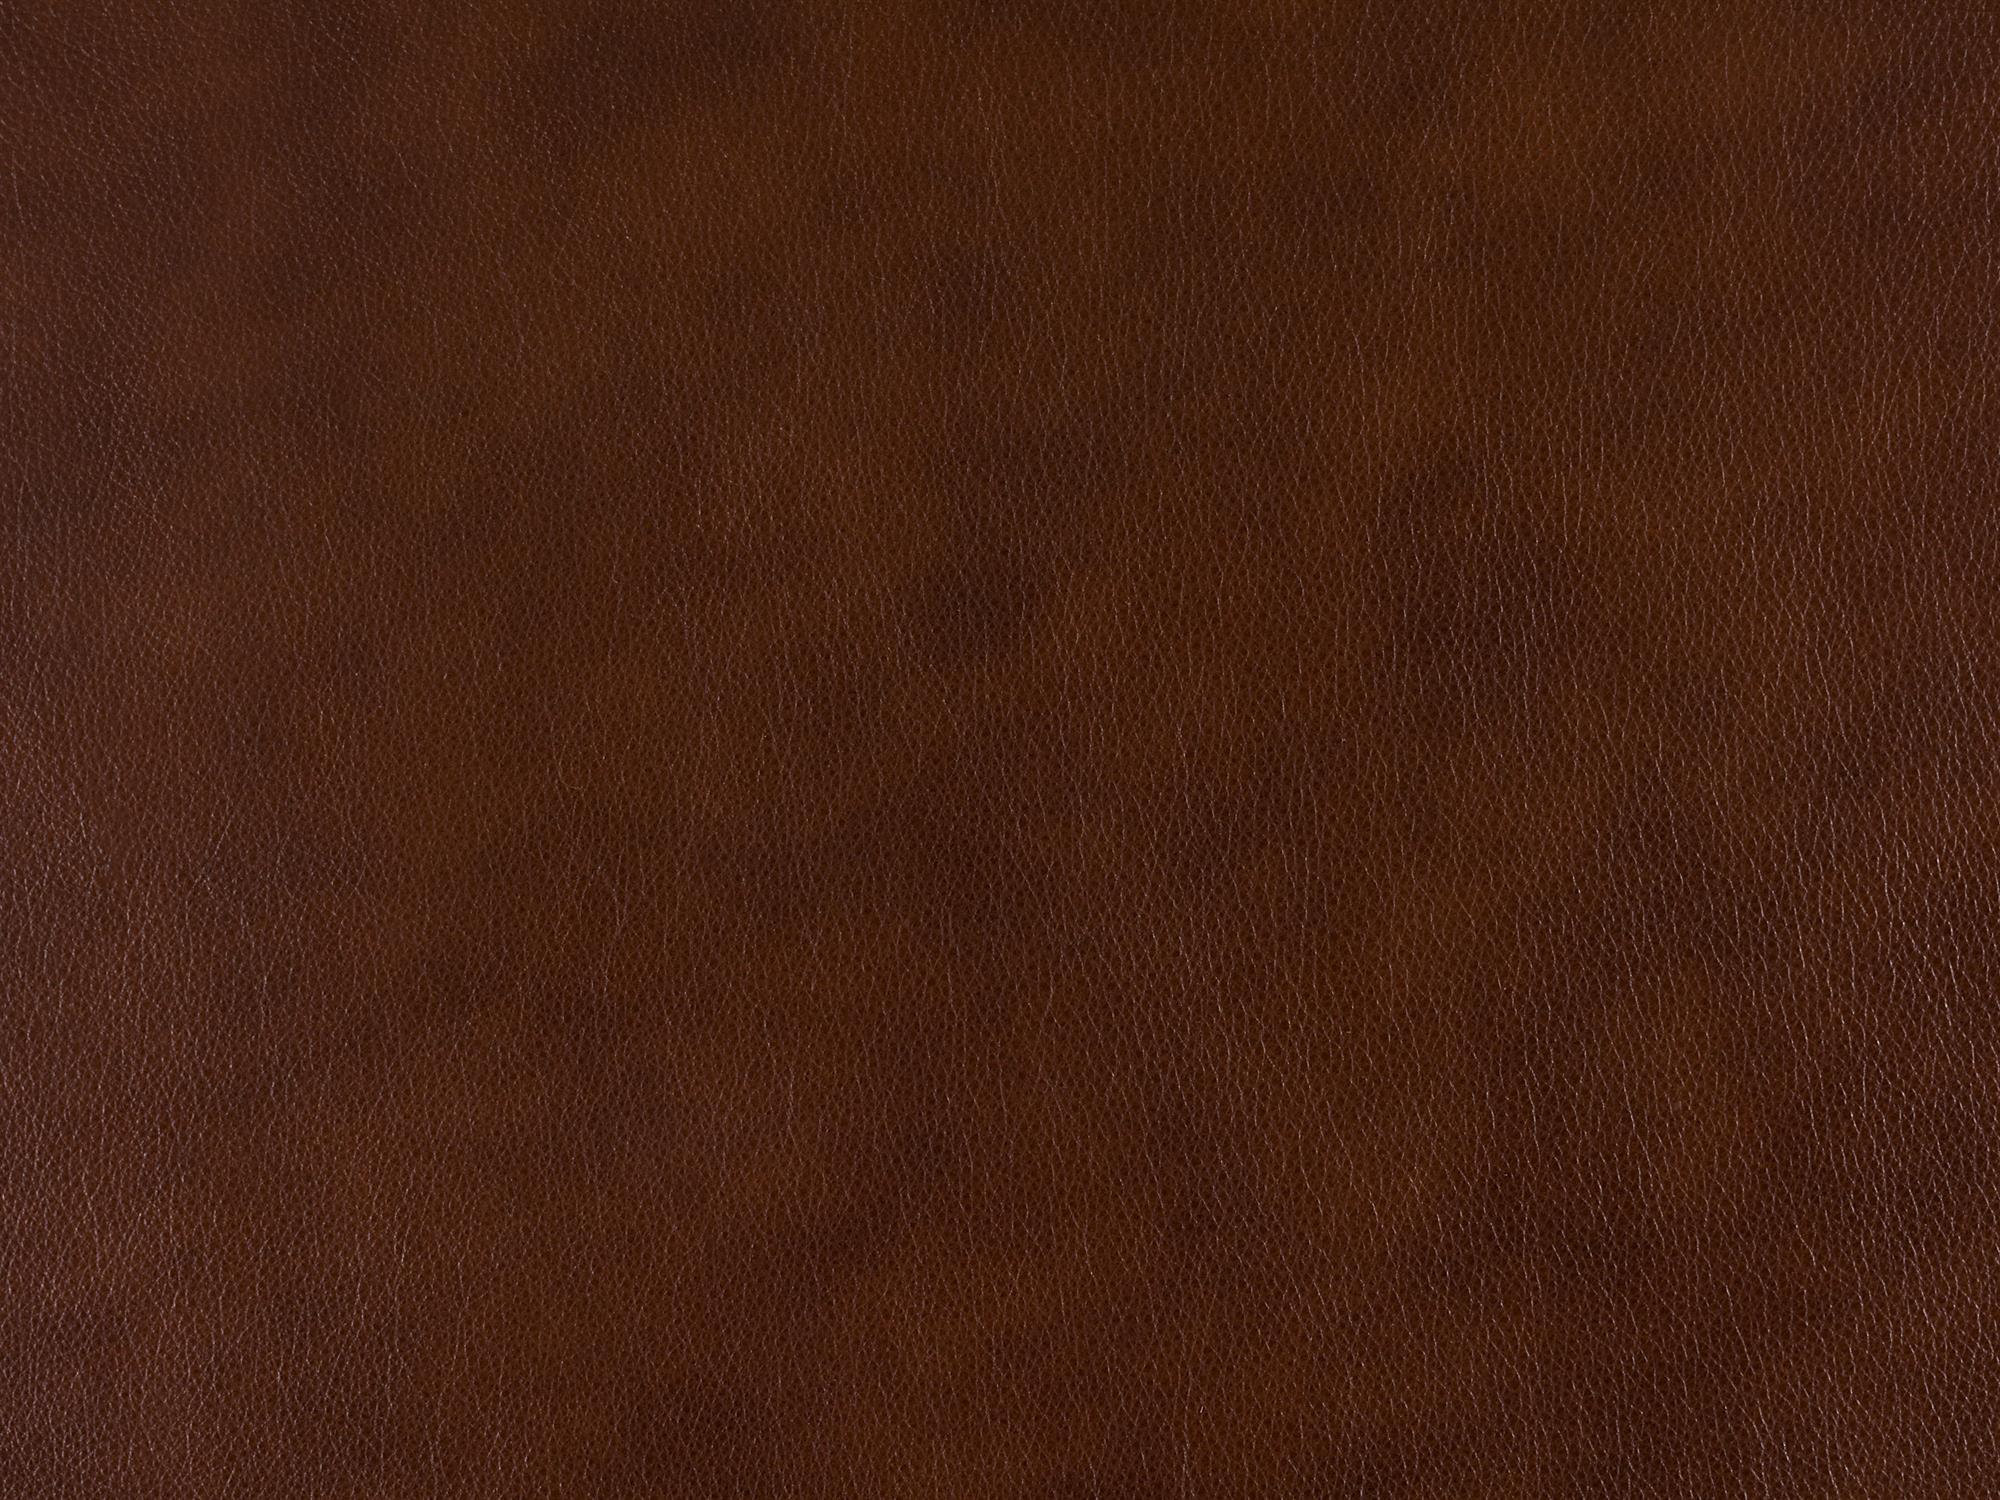 Bradington Young Reece Traditional 4-Seat Sectional Sofa